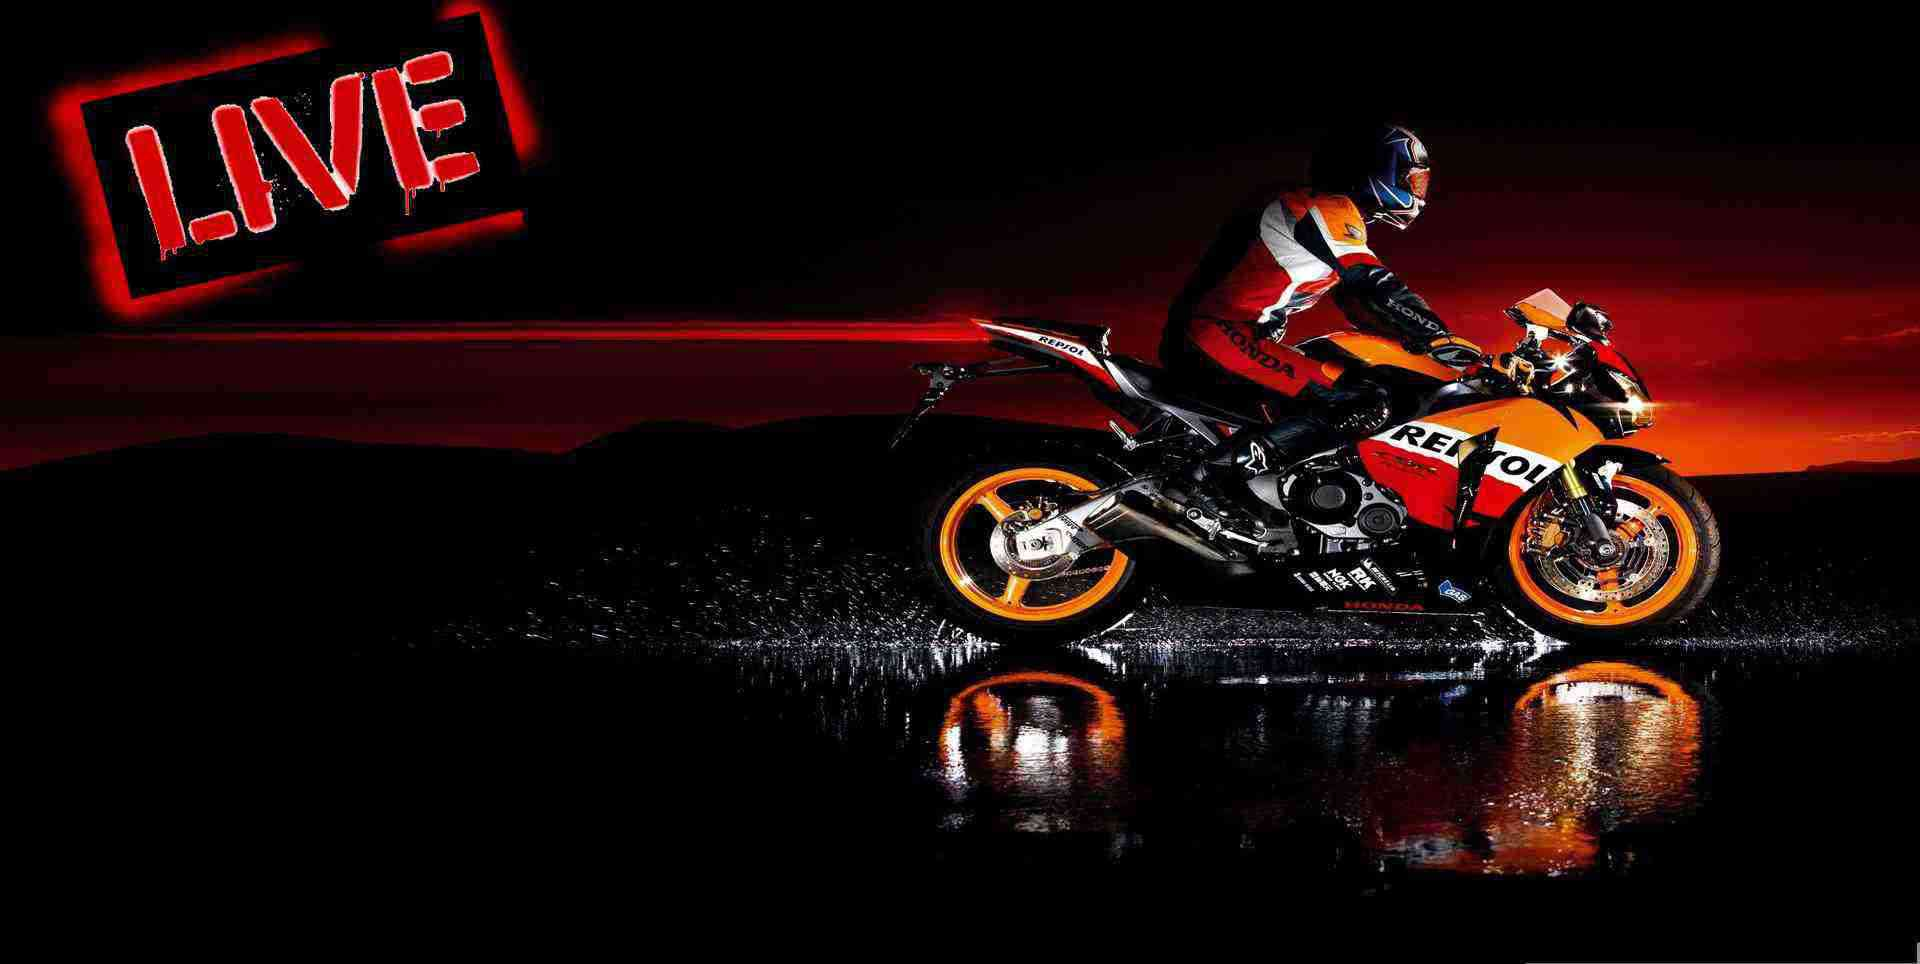 MotoGP Motul Japan Grand Prix 2015 Live On Windows